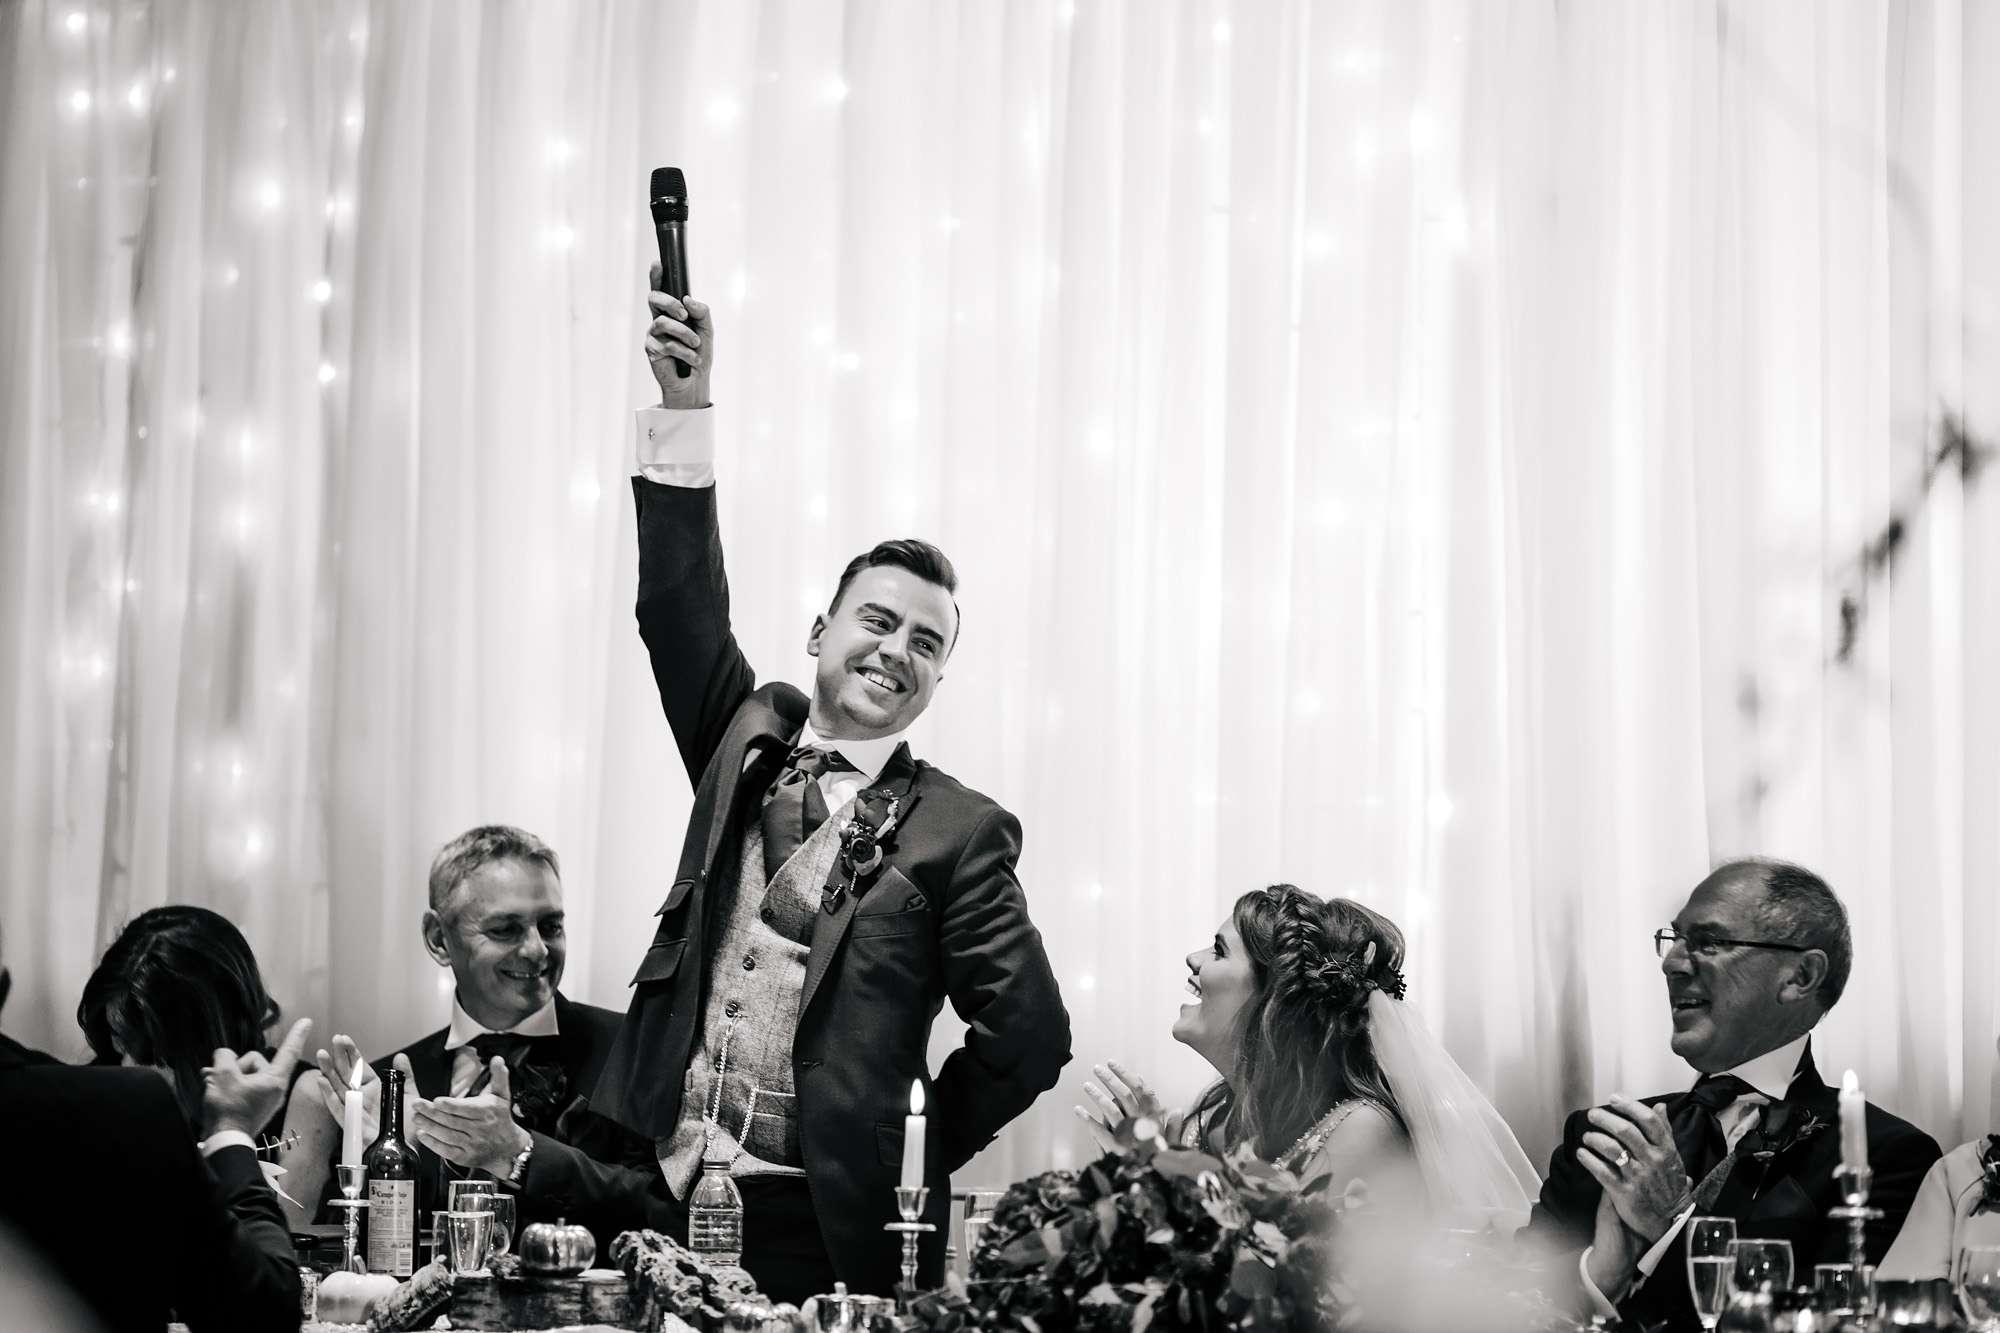 Grooms speech at his wedding